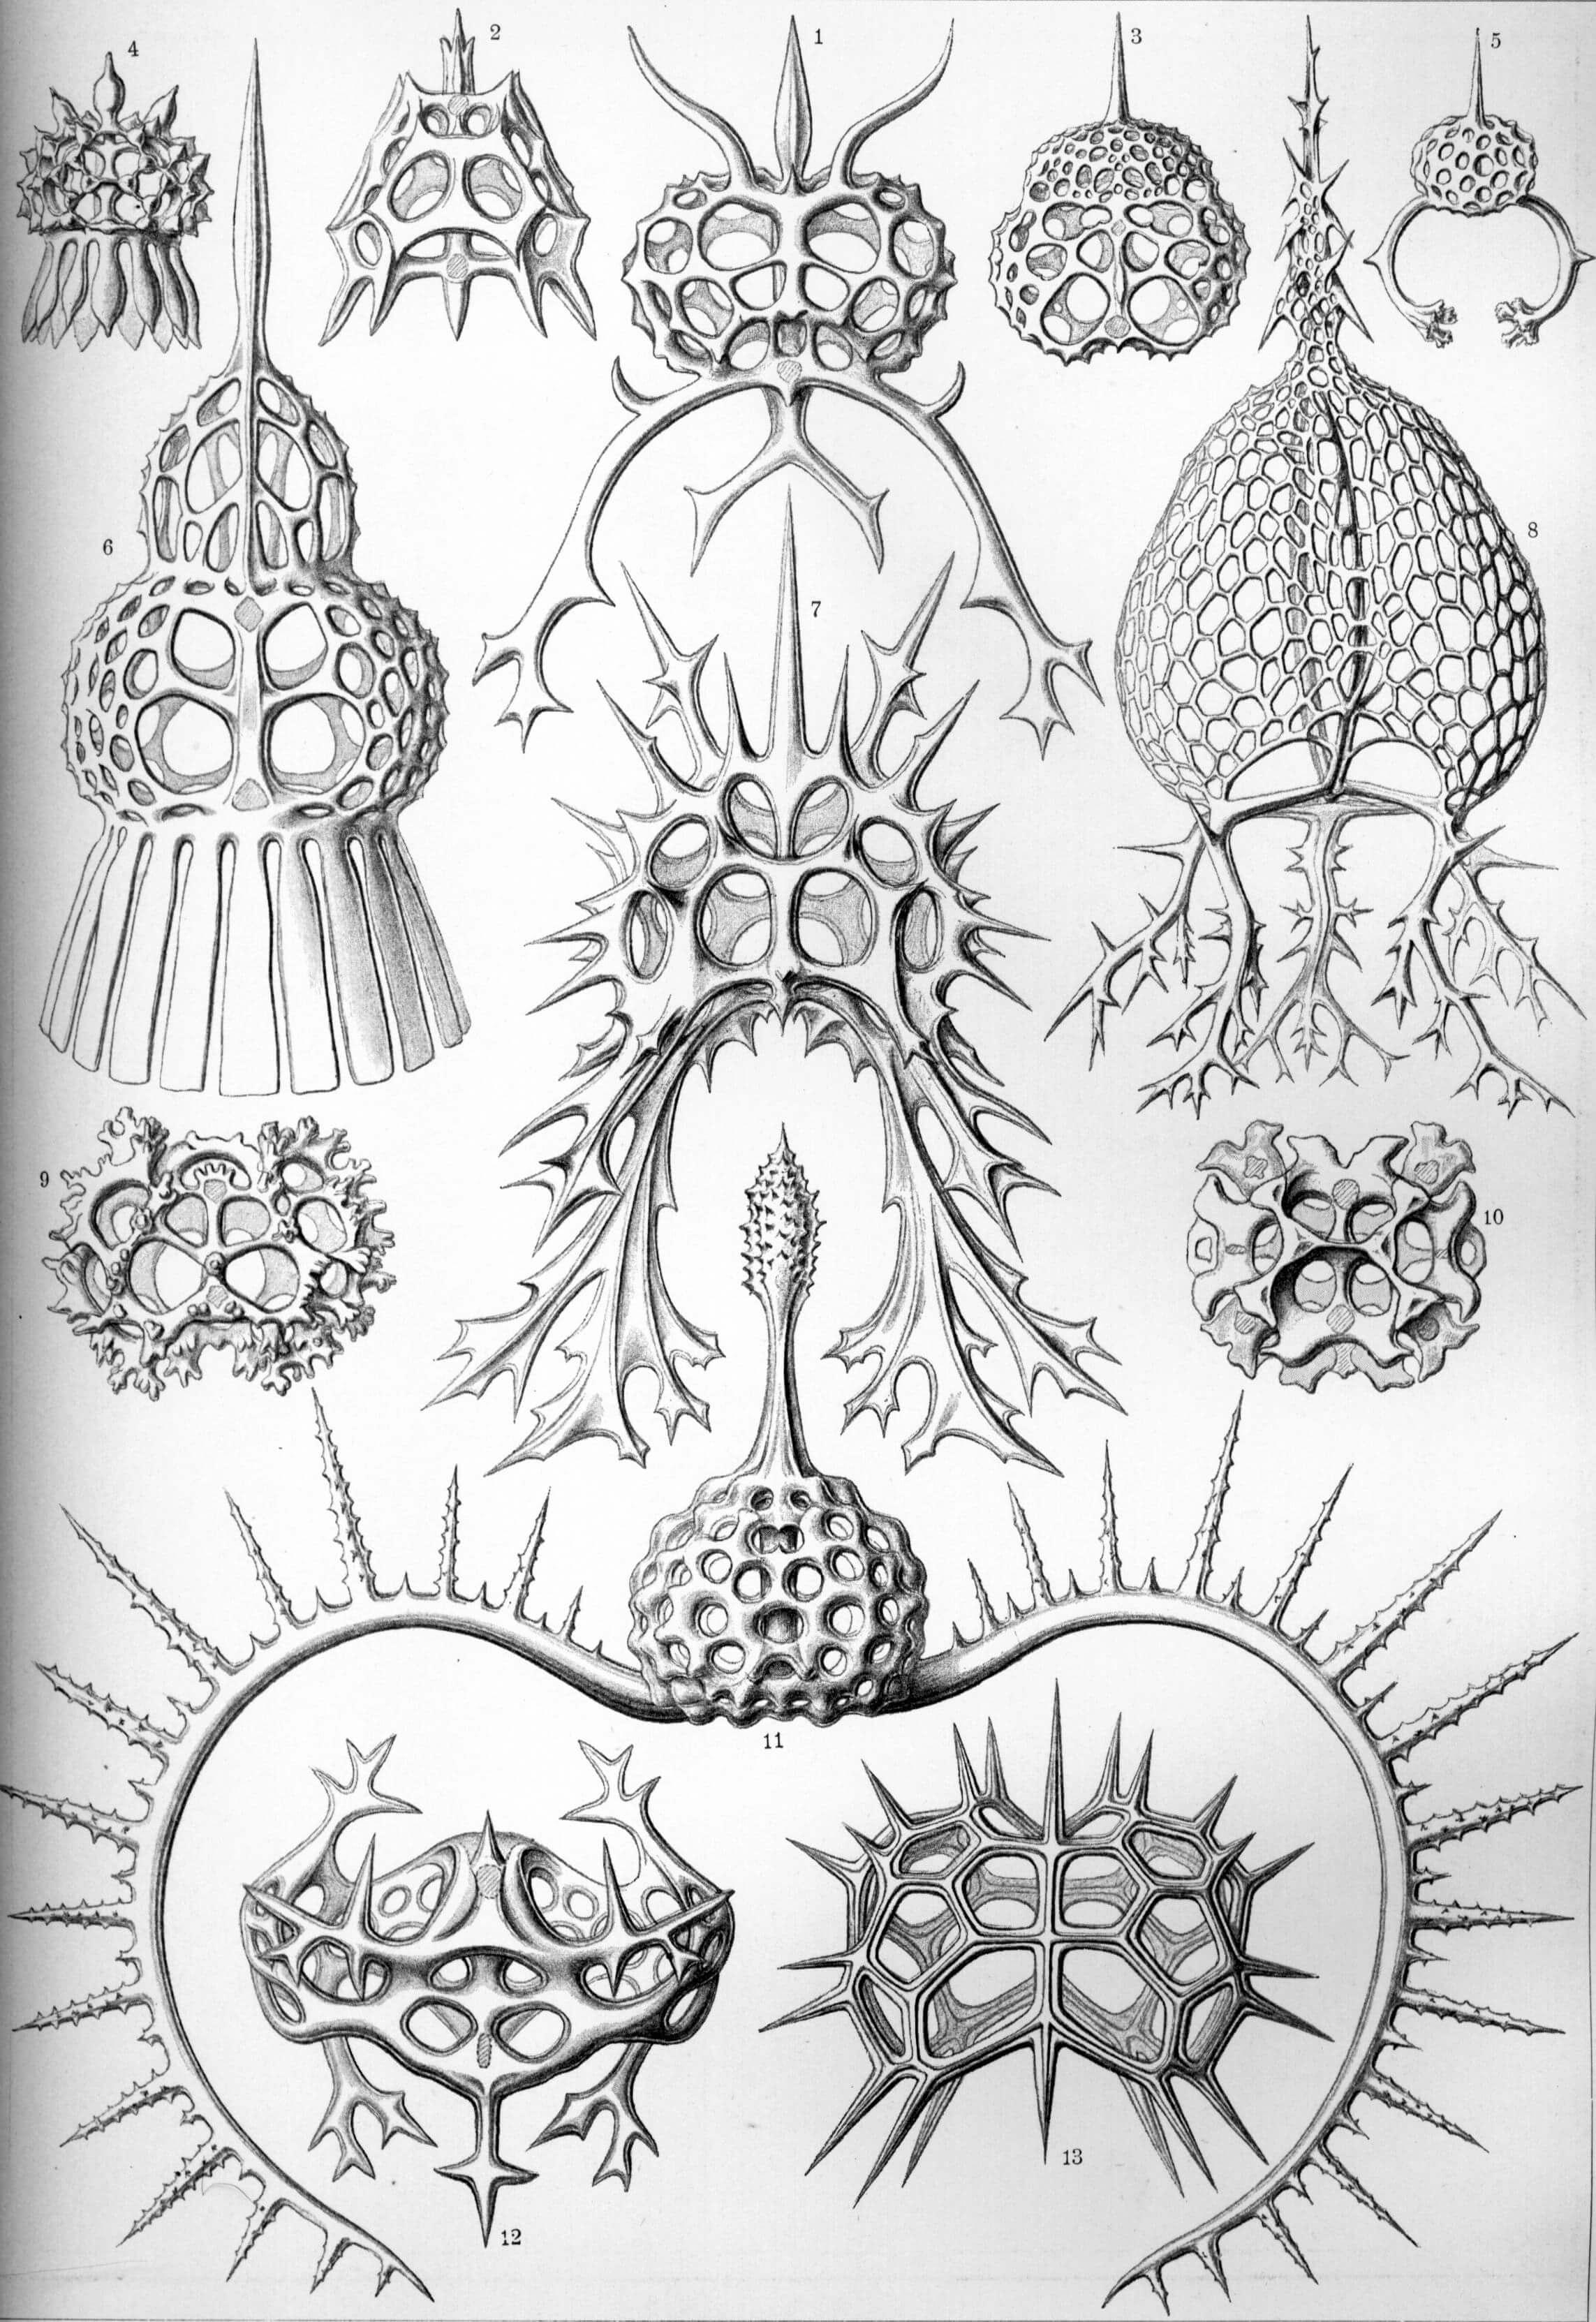 Spyroidea - Ernst Haeckel